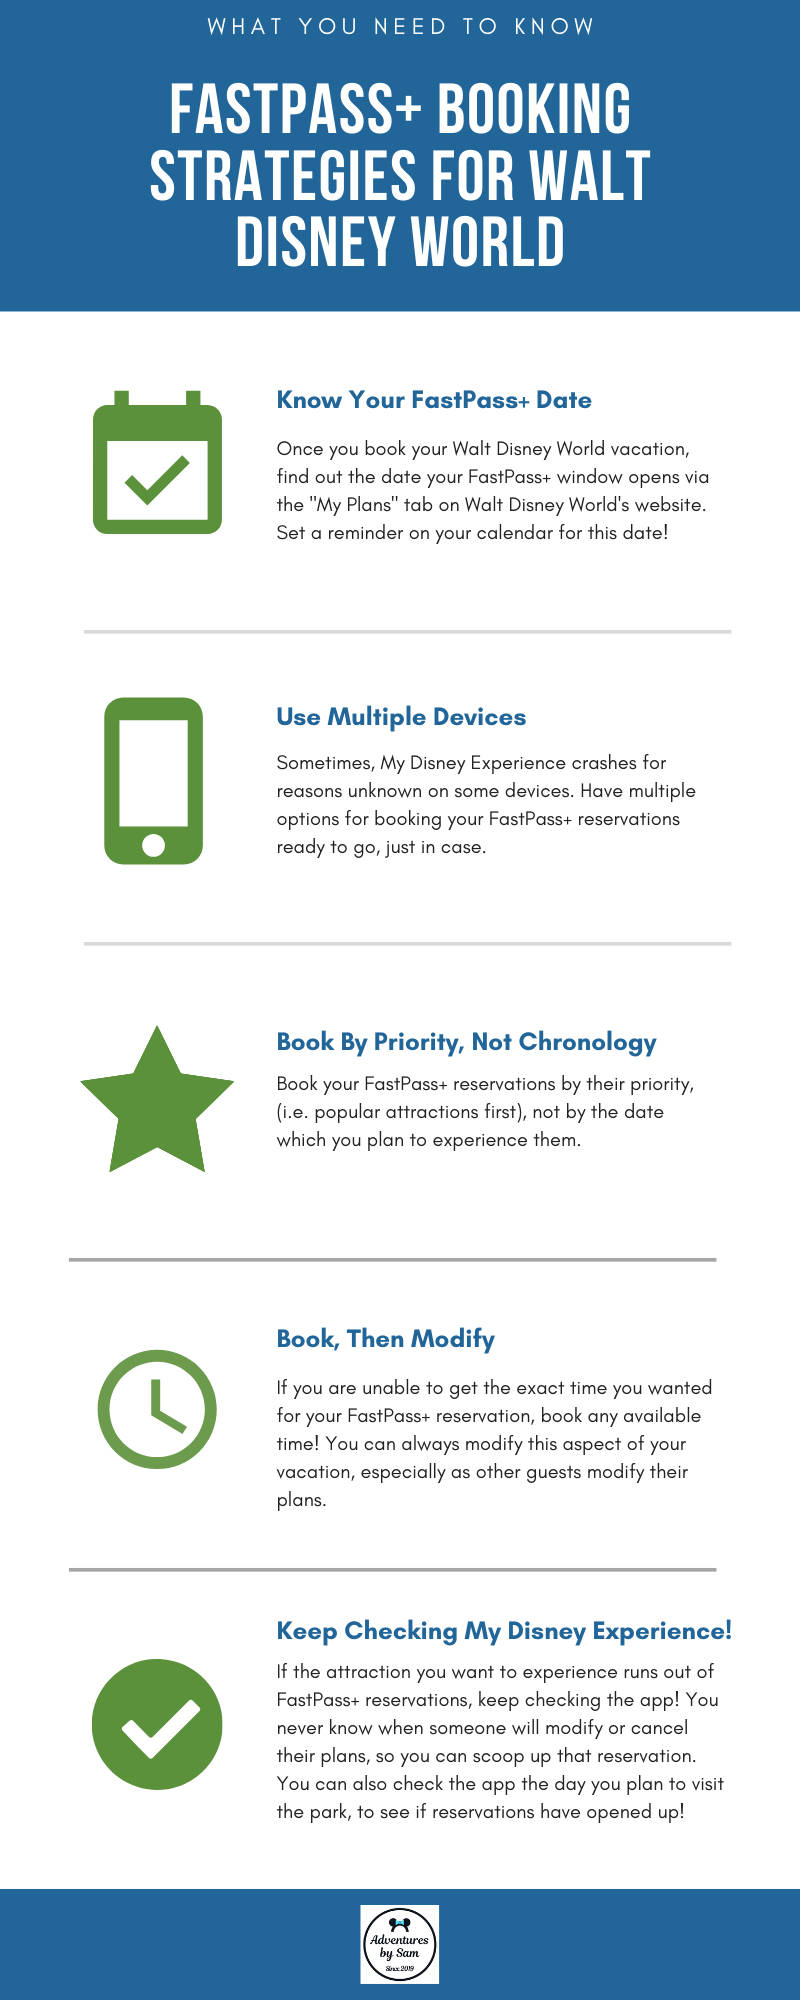 FastPass+ Booking Strategies for Walt Disney World (Infographic)